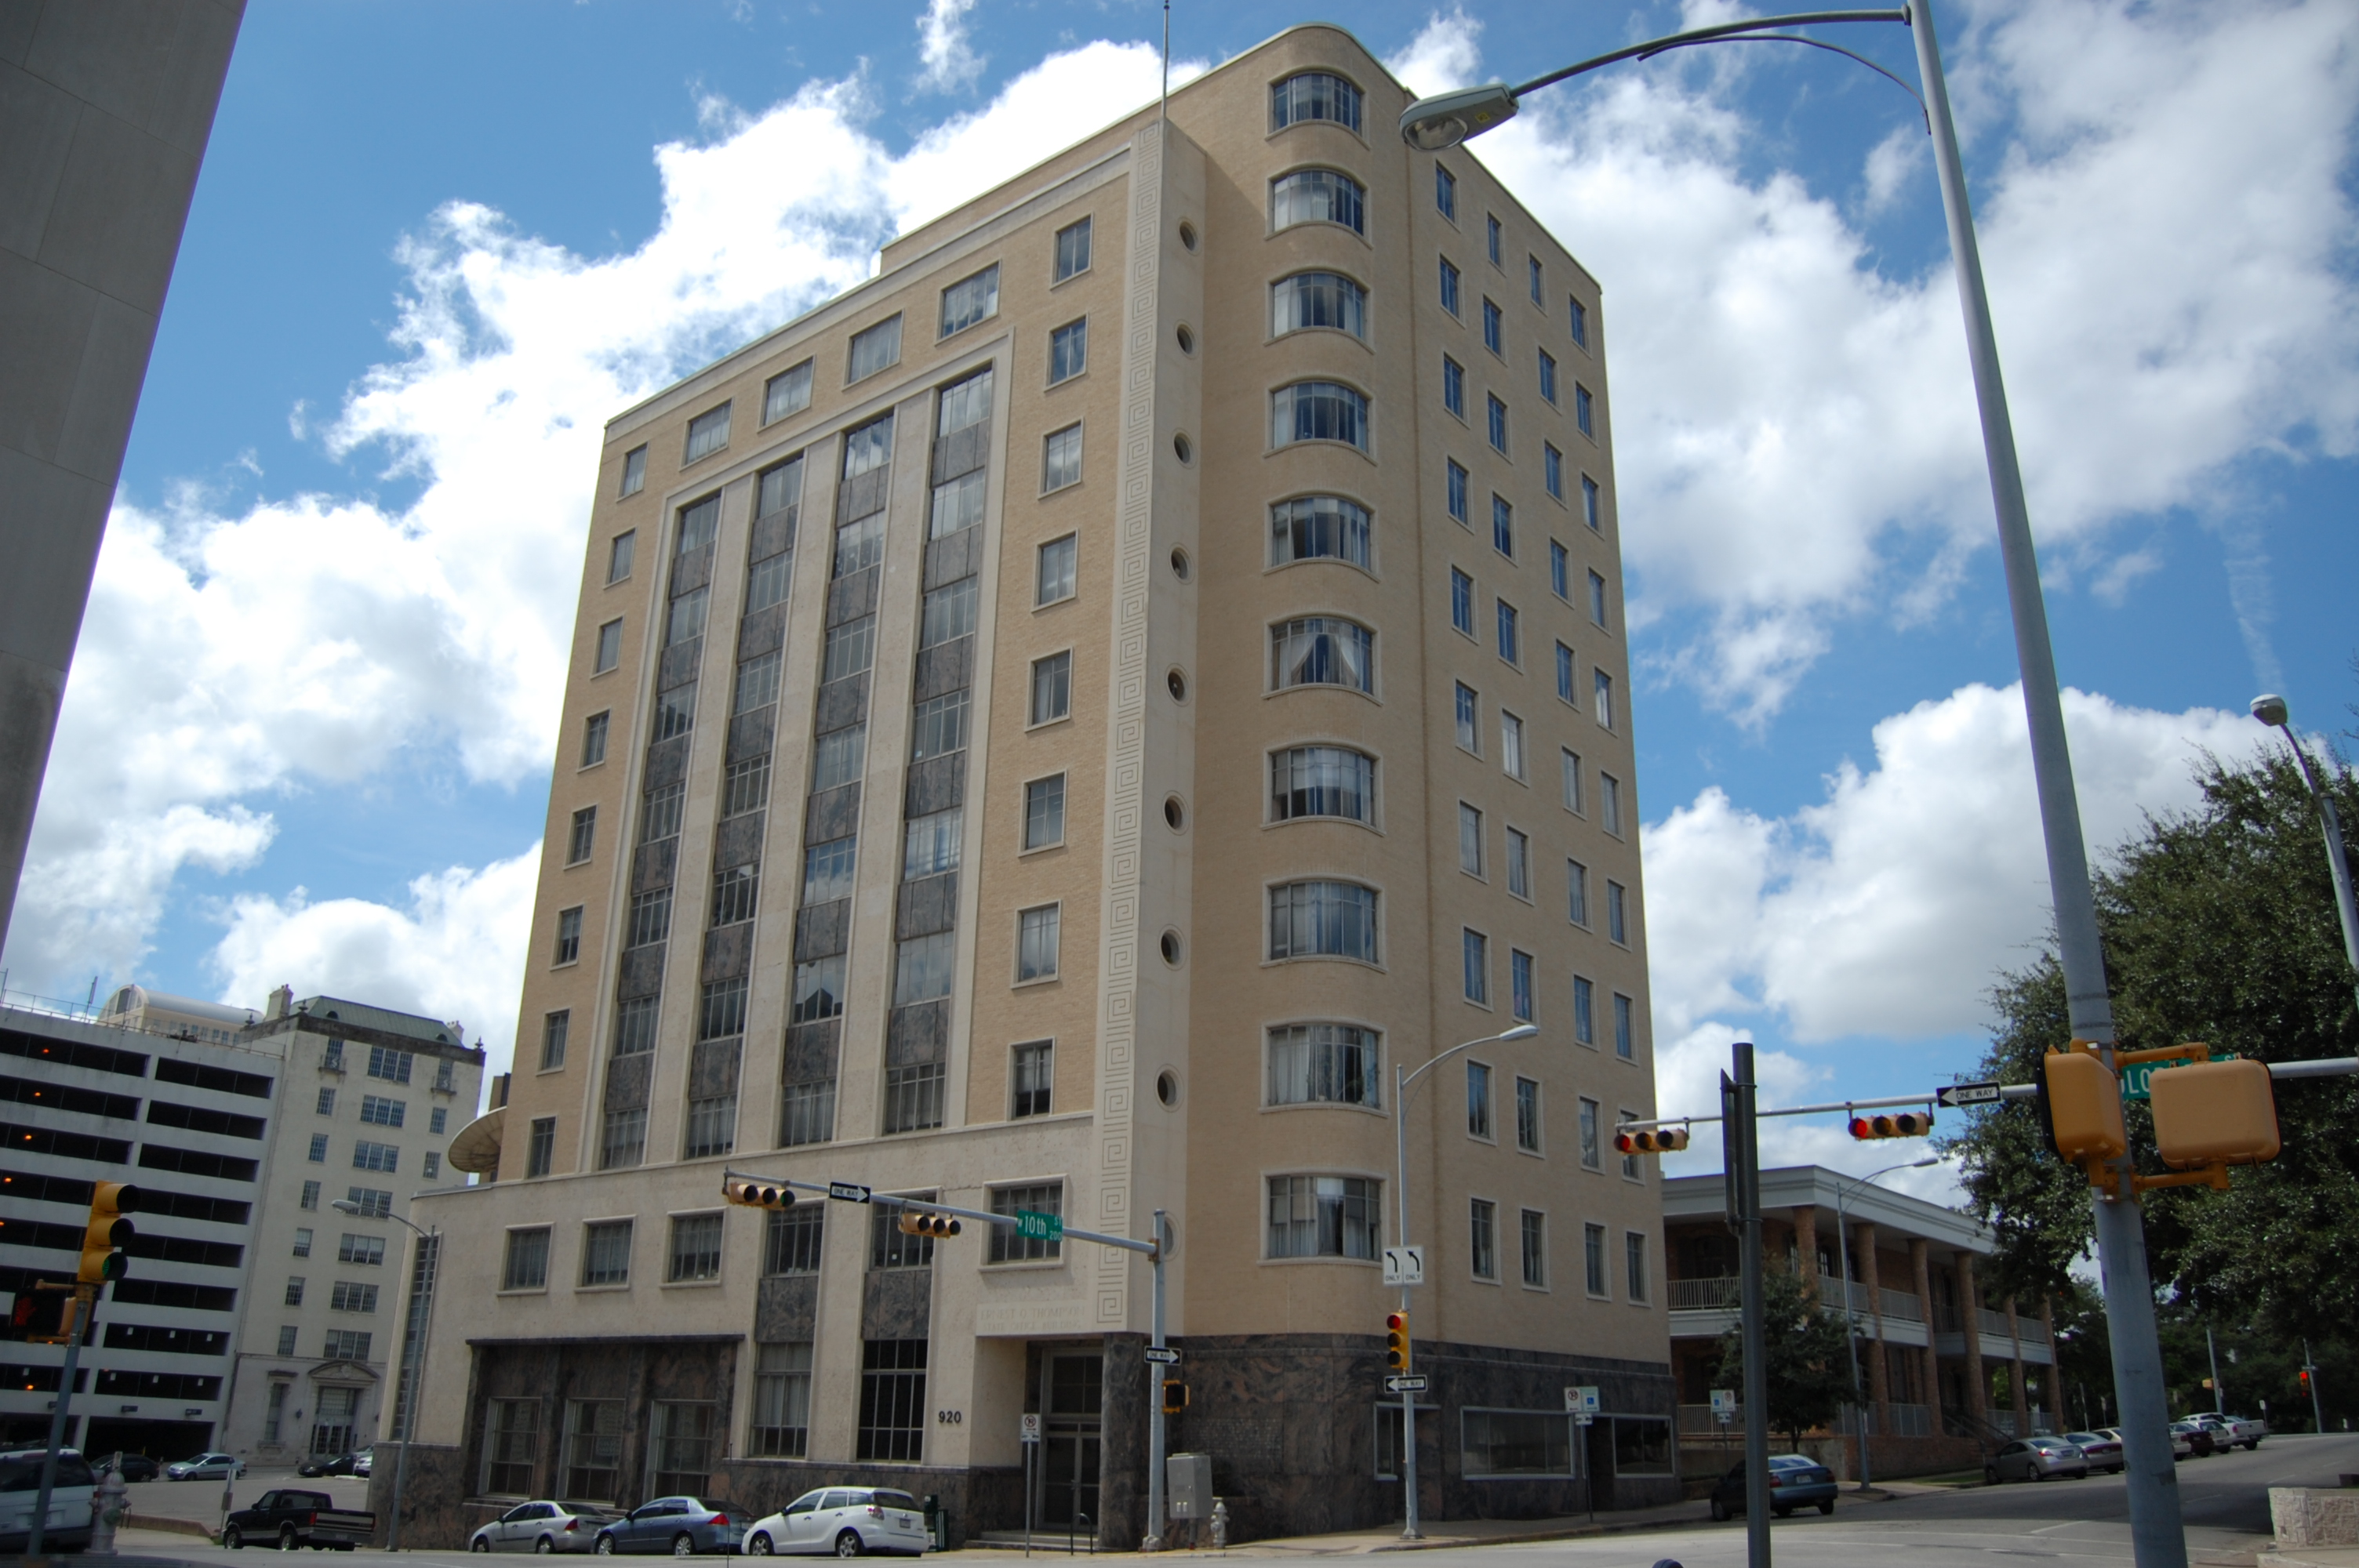 Austin Daily Tribune Building